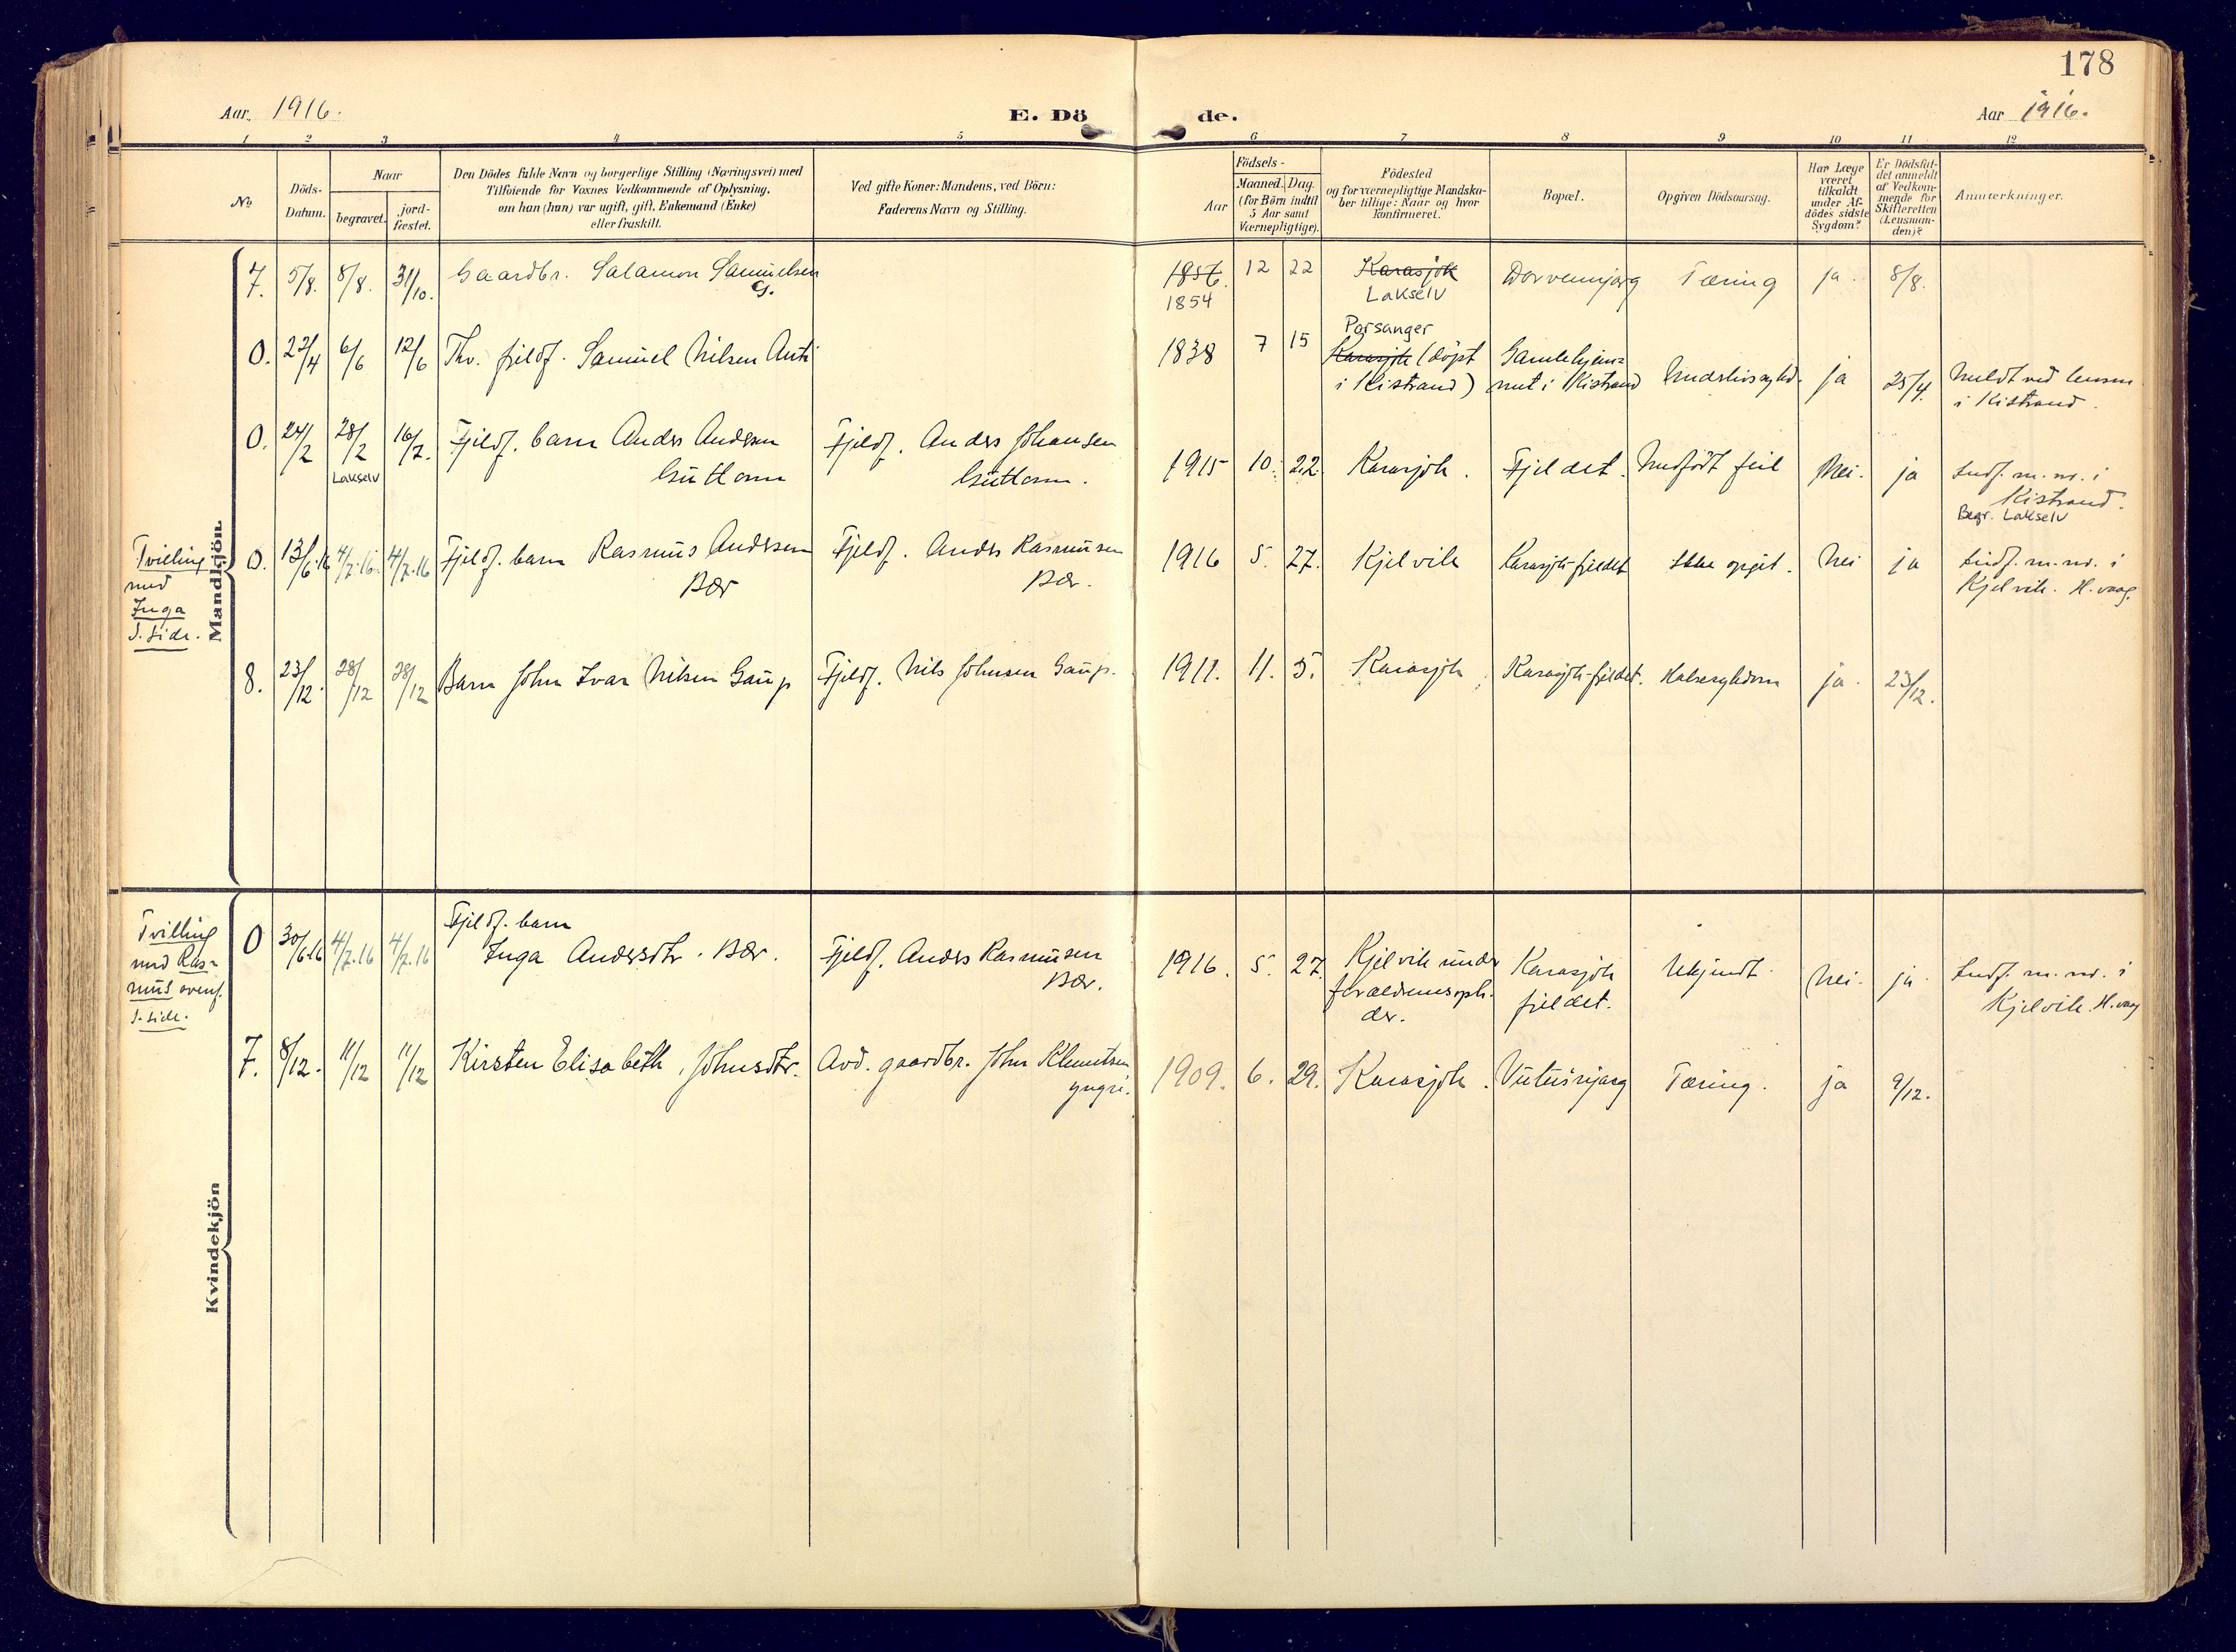 SATØ, Karasjok sokneprestkontor, H/Ha: Ministerialbok nr. 3, 1907-1926, s. 178